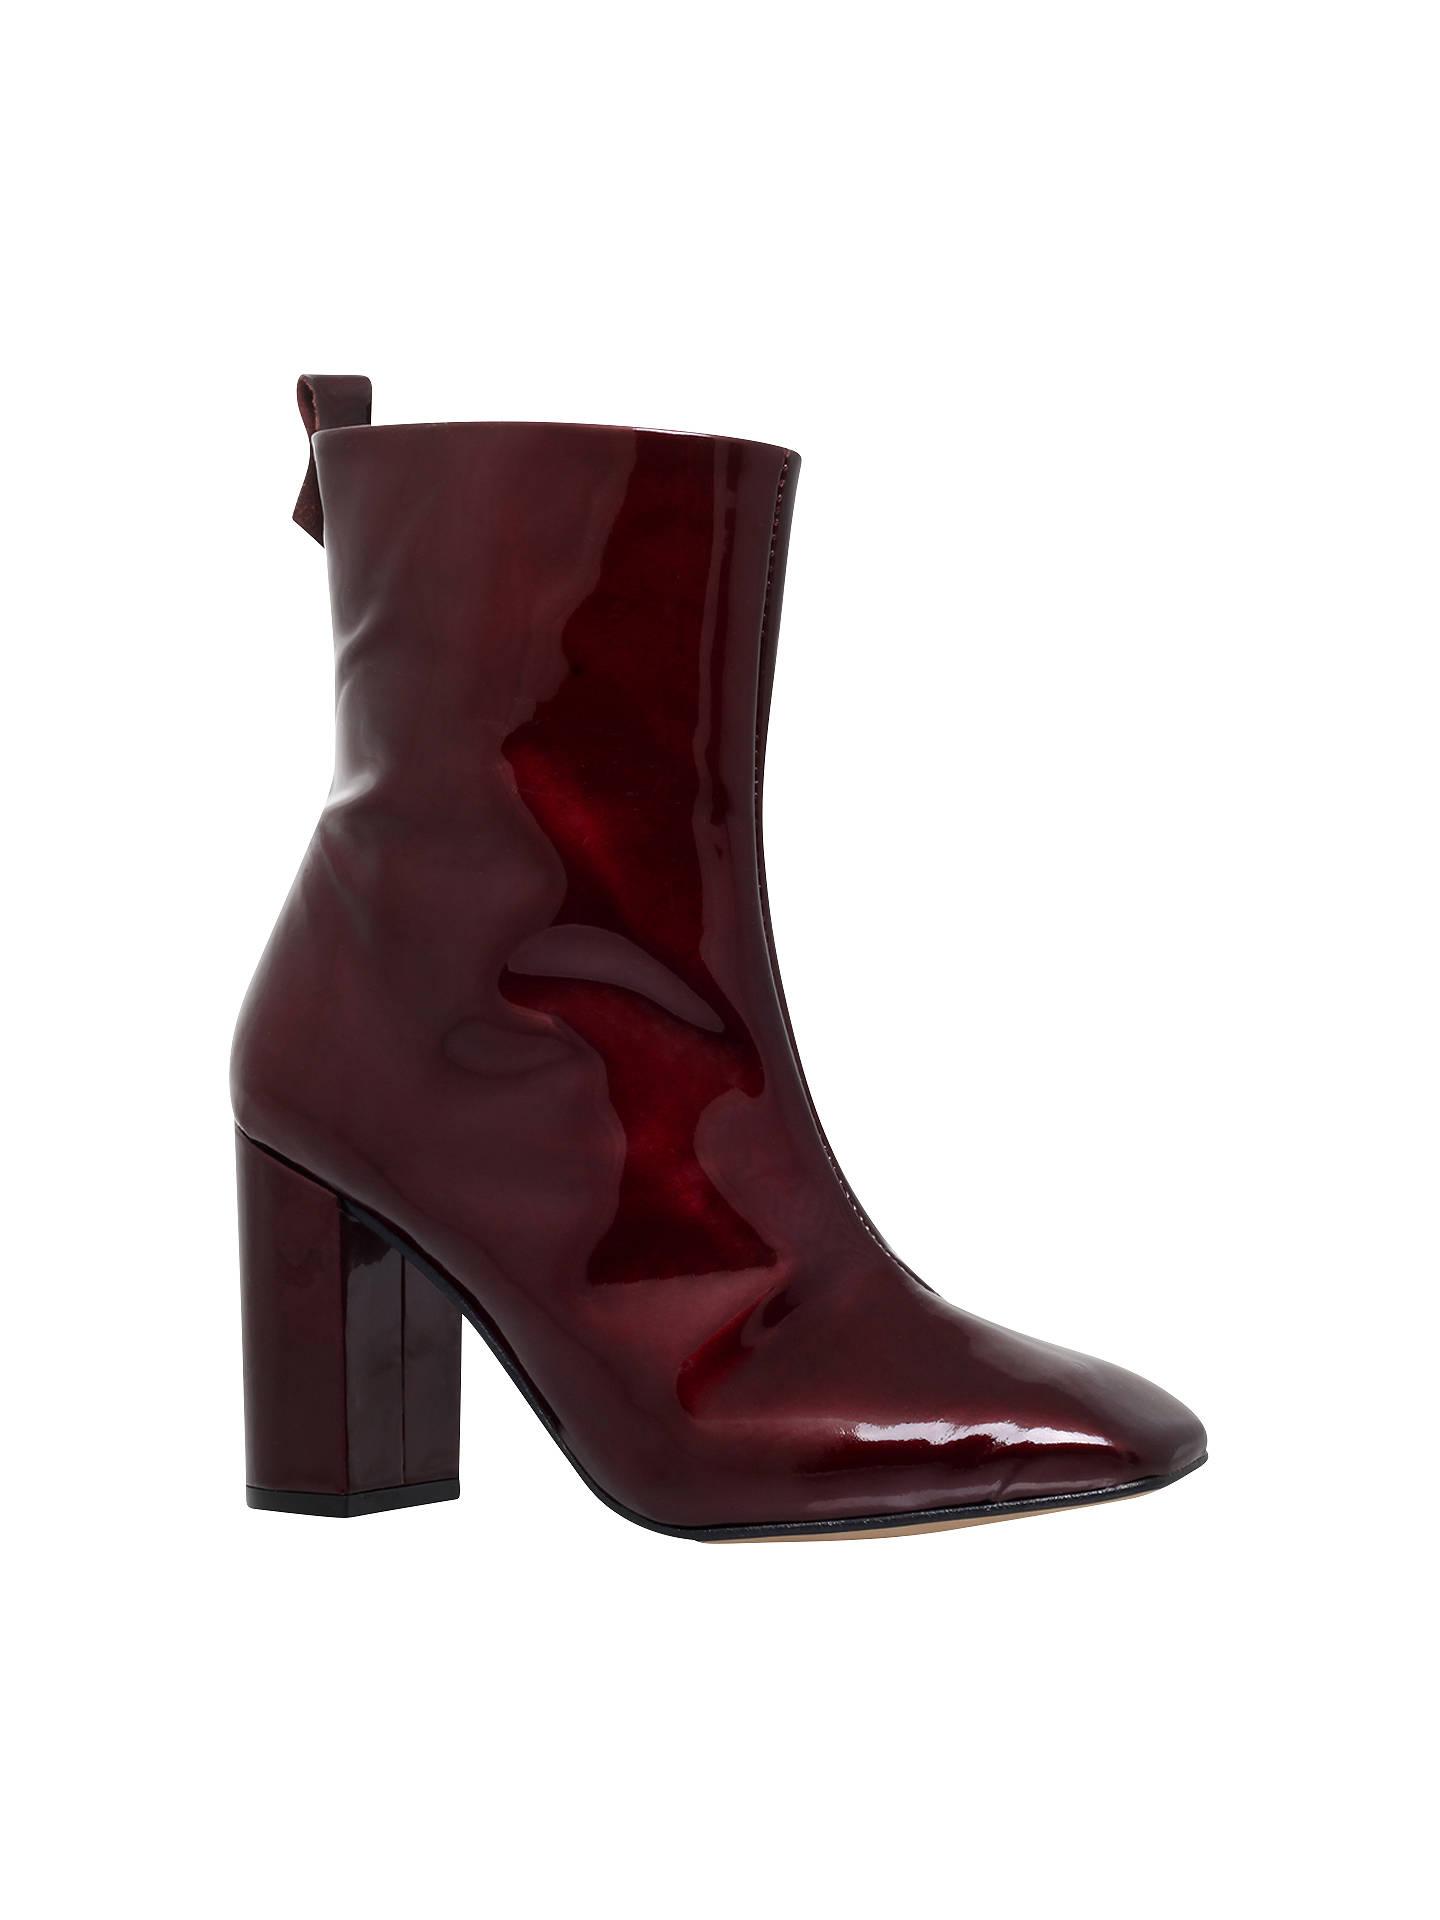 KG by Kurt Geiger Strut Block Heeled Ankle Boots at John